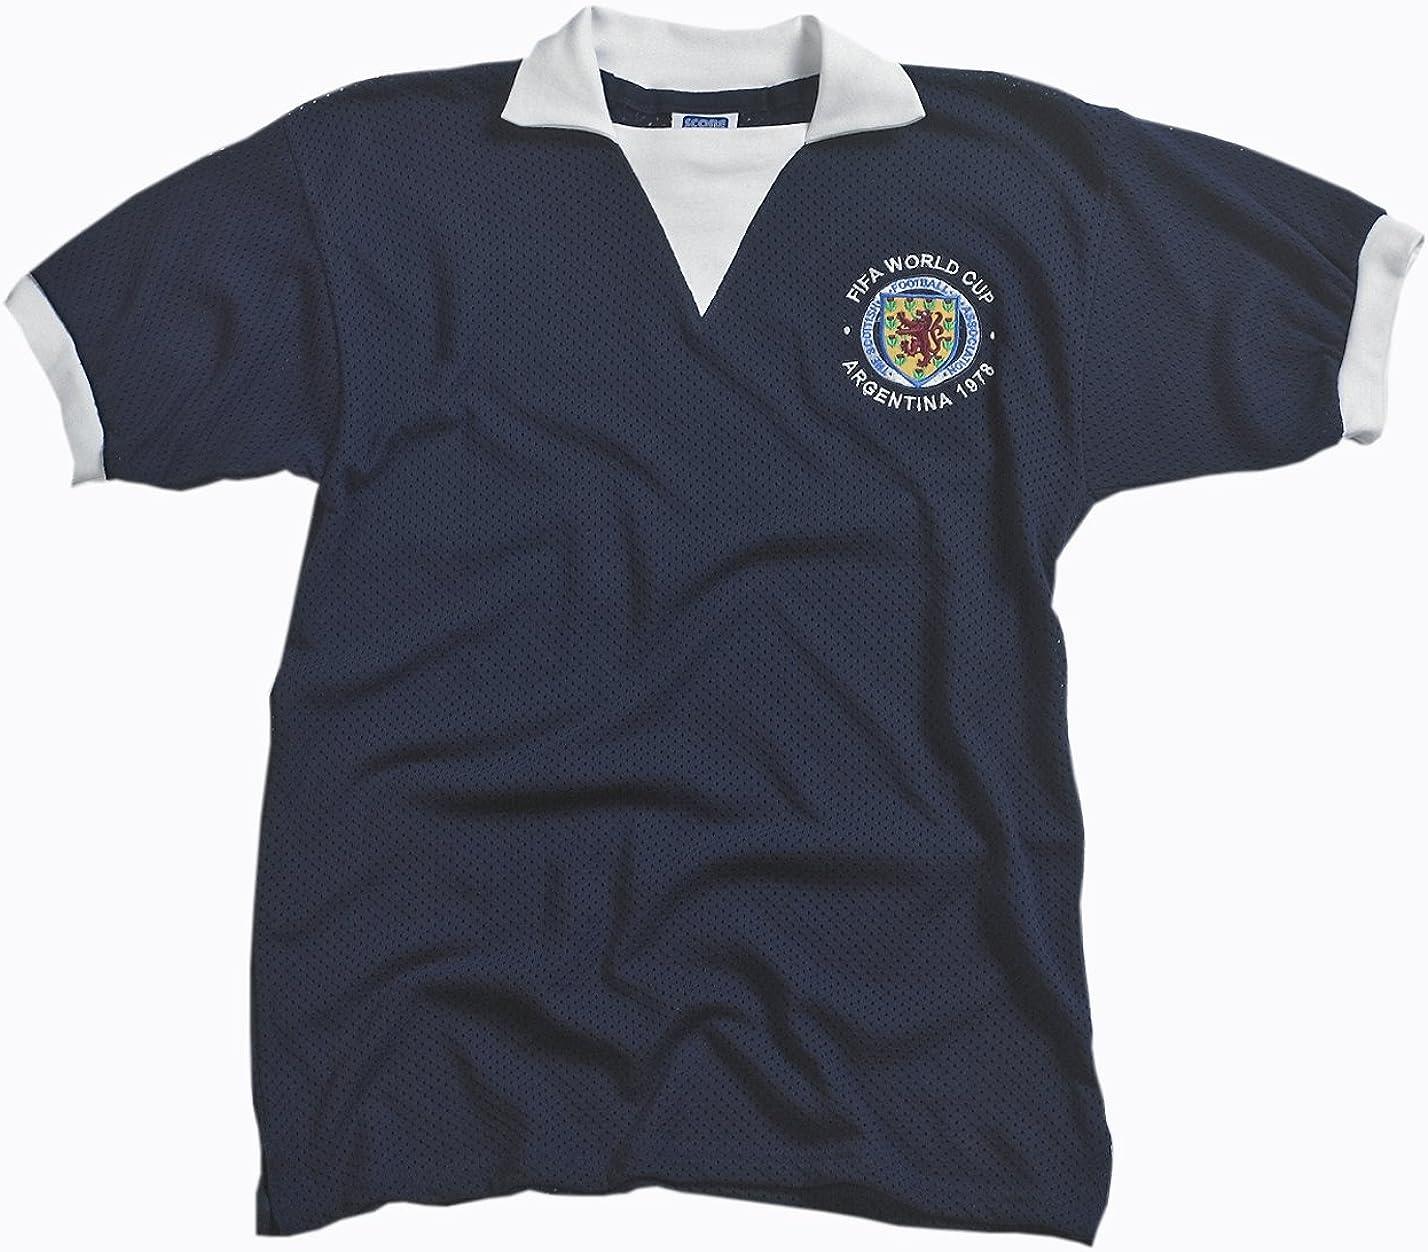 Score Draw Official Retro West Ham - Camiseta de Deporte y Fans ...